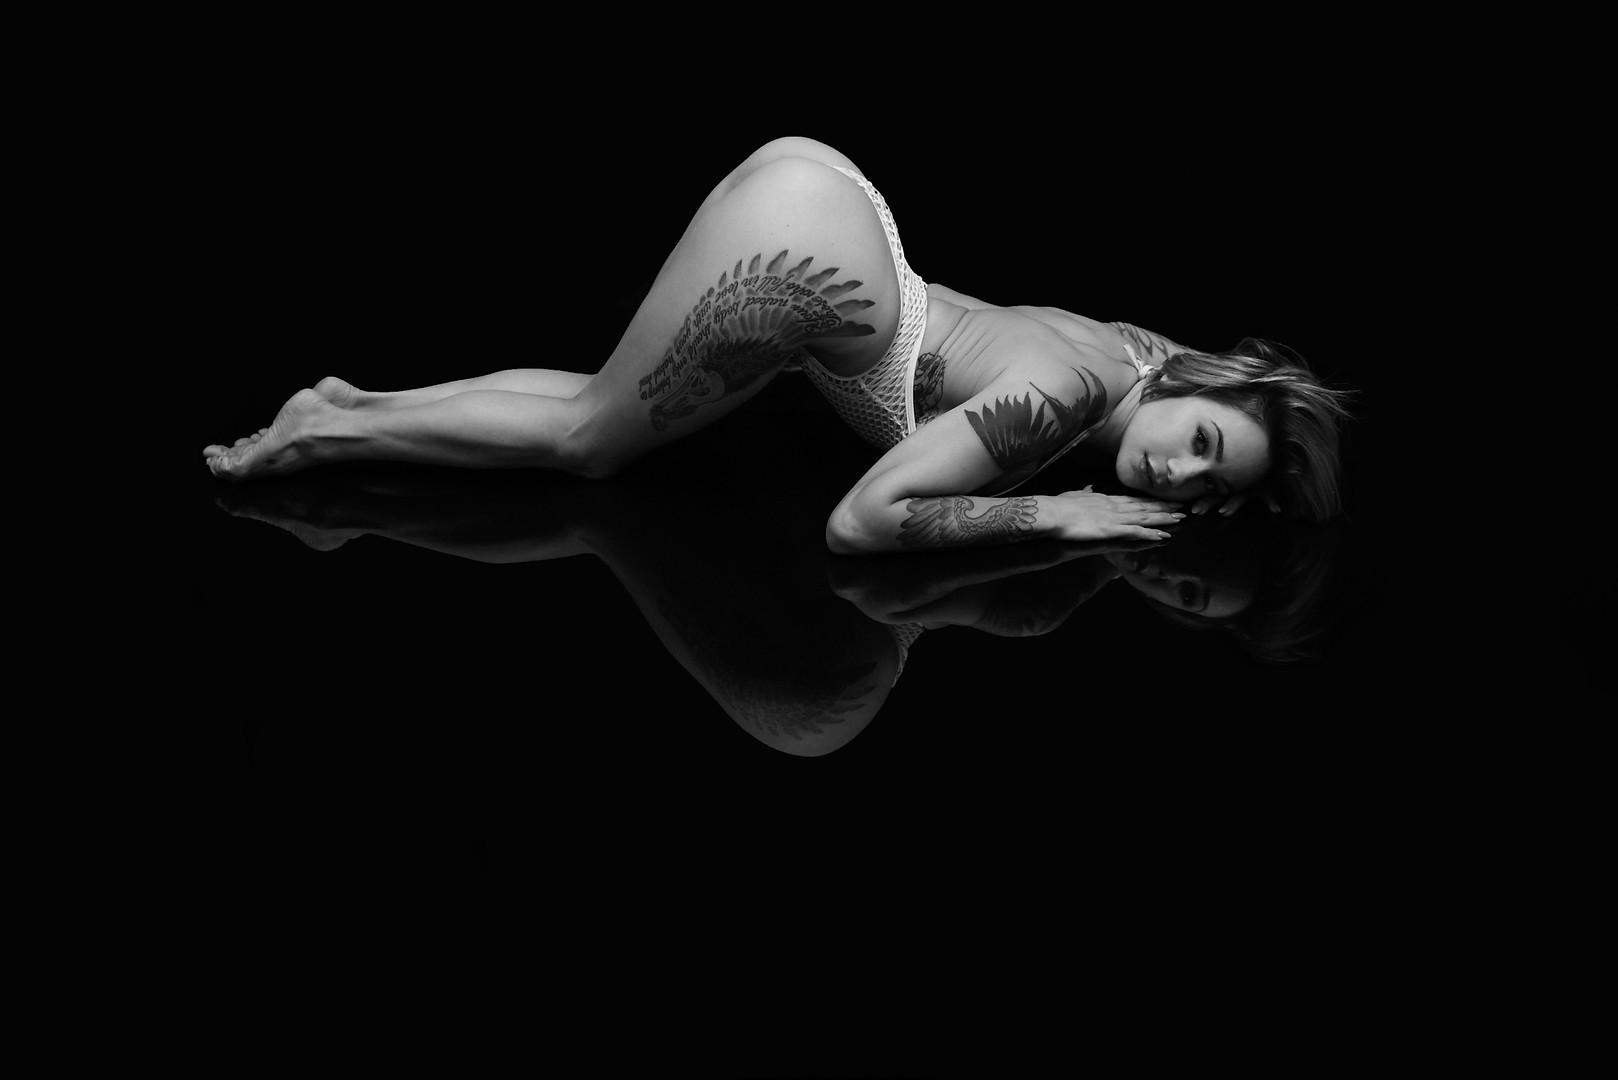 Reflective surface